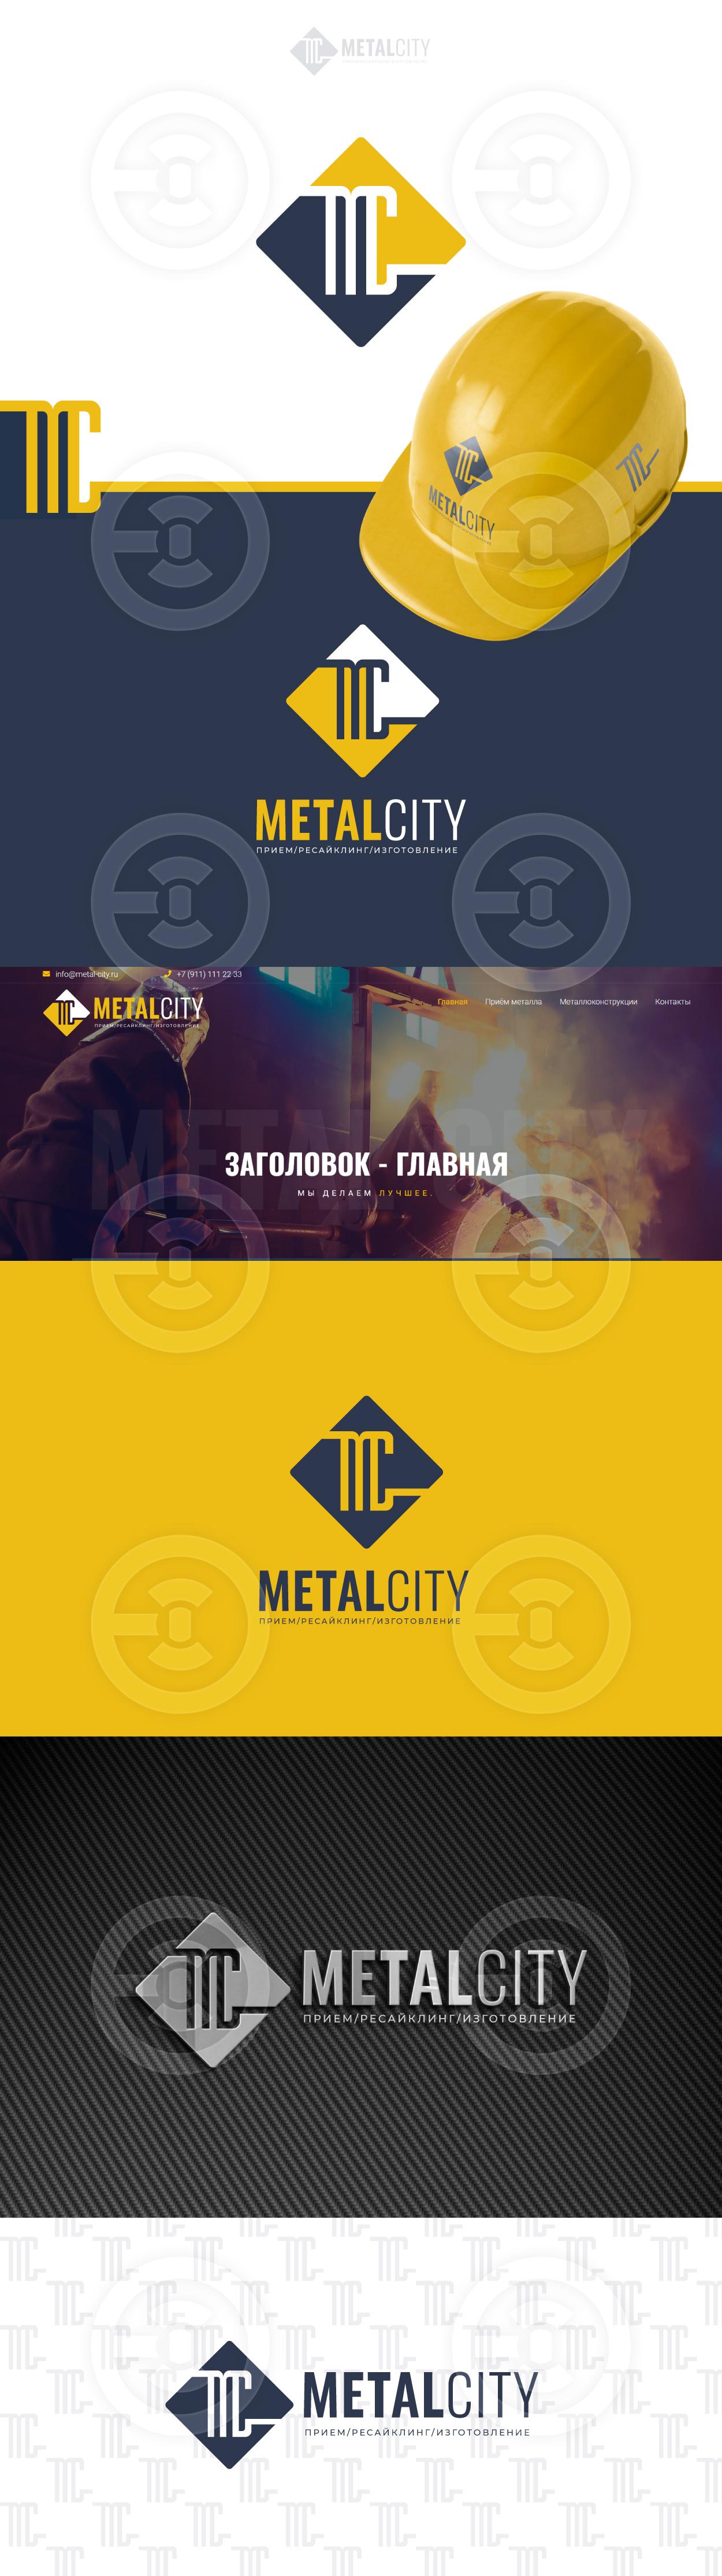 MetalCity---01.jpg